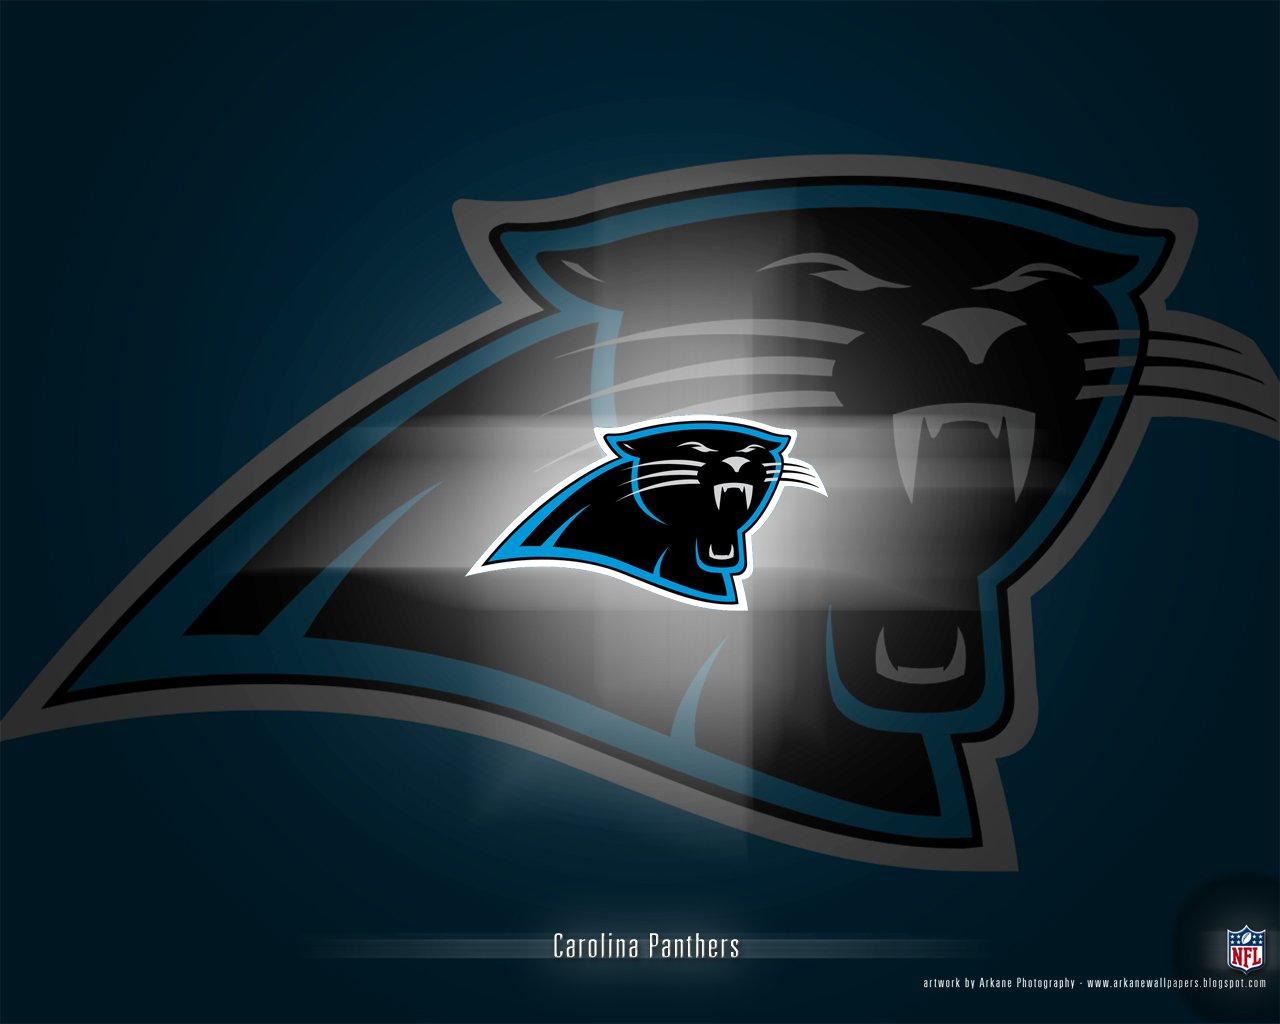 Arkane NFL Wallpapers Carolina Panthers   Vol 1 1280x1024